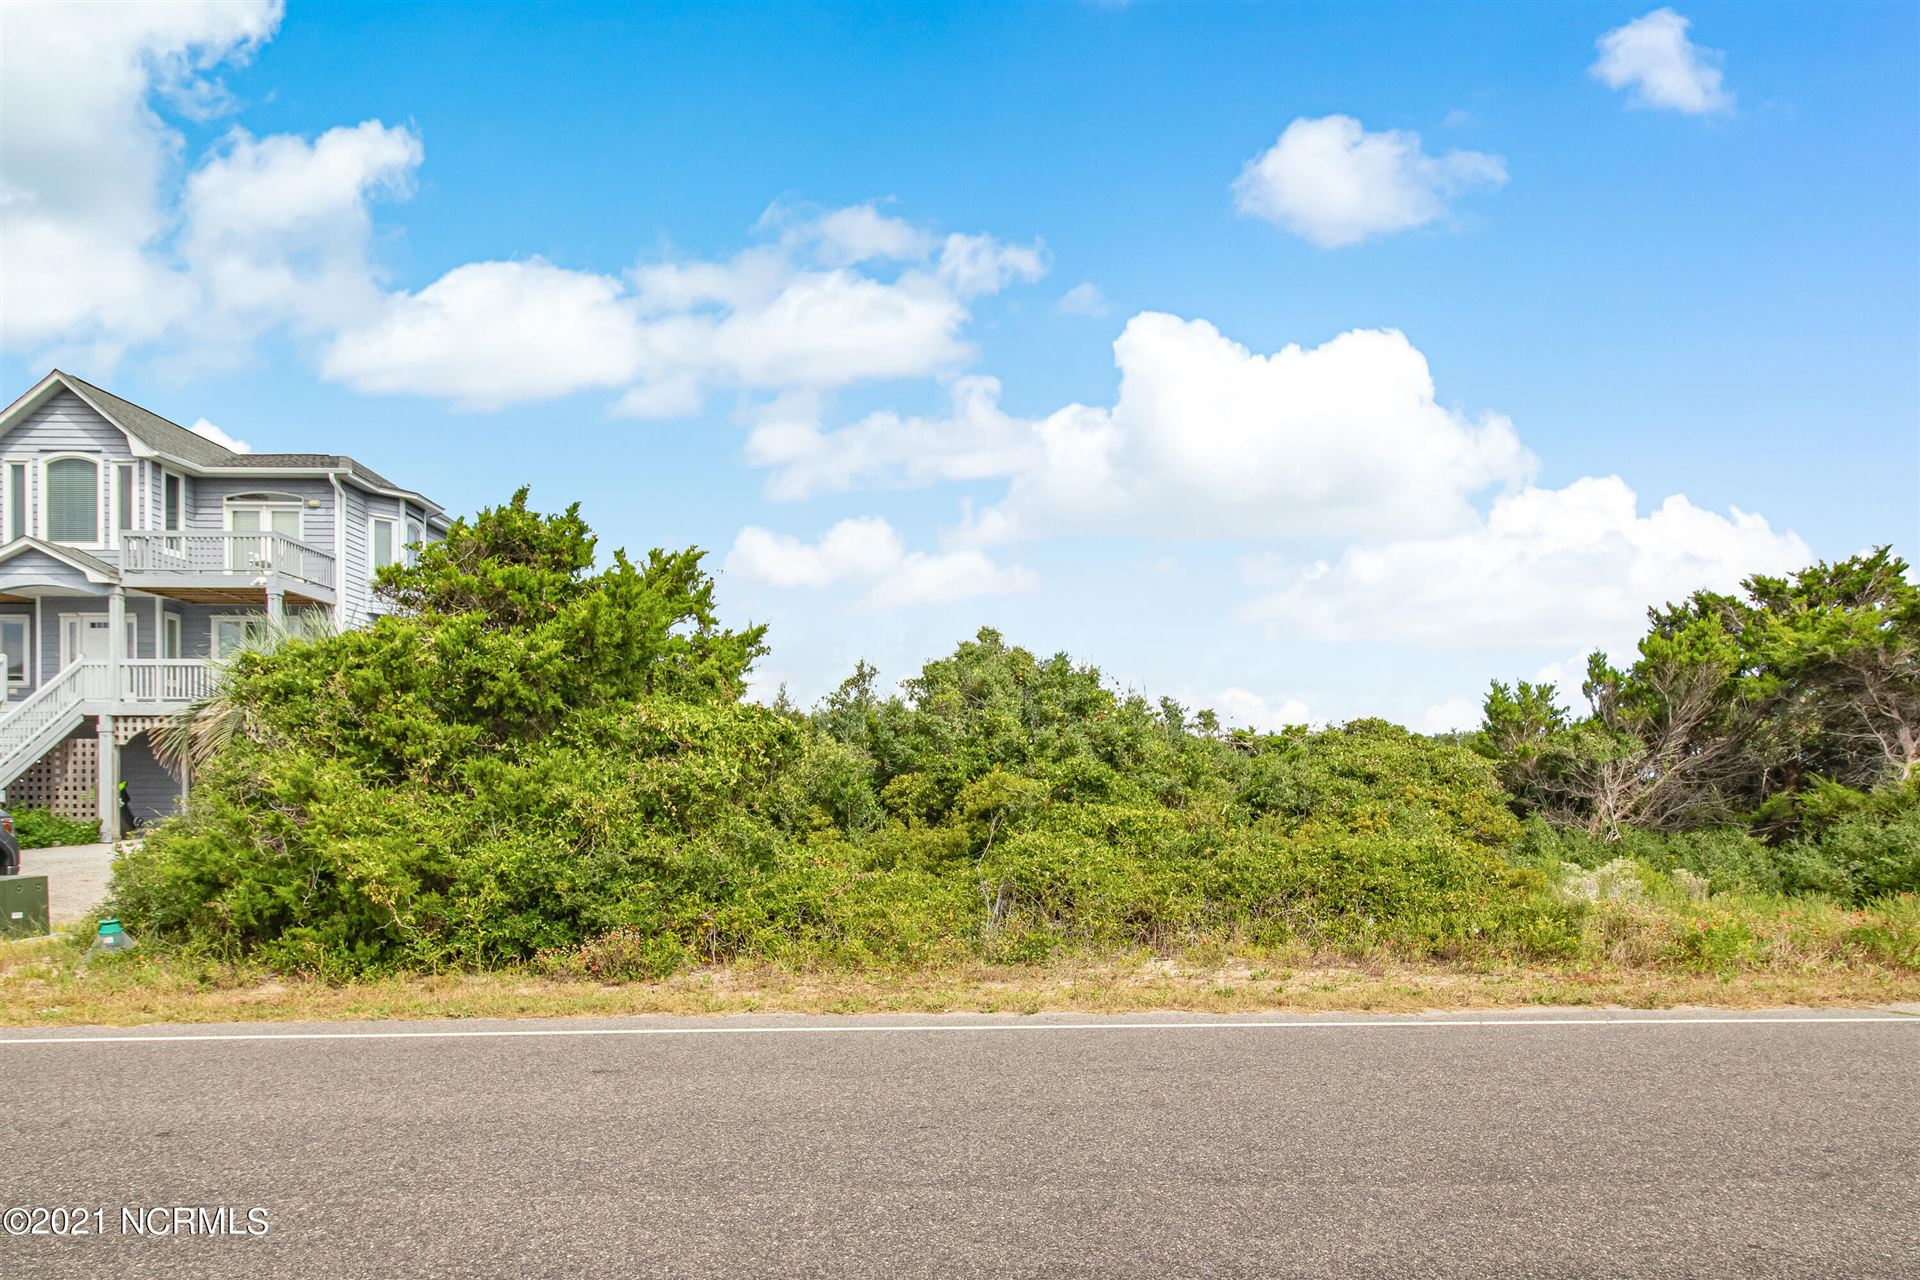 Photo of L-25 Caswell Beach Road, Caswell Beach, NC 28465 (MLS # 100295441)